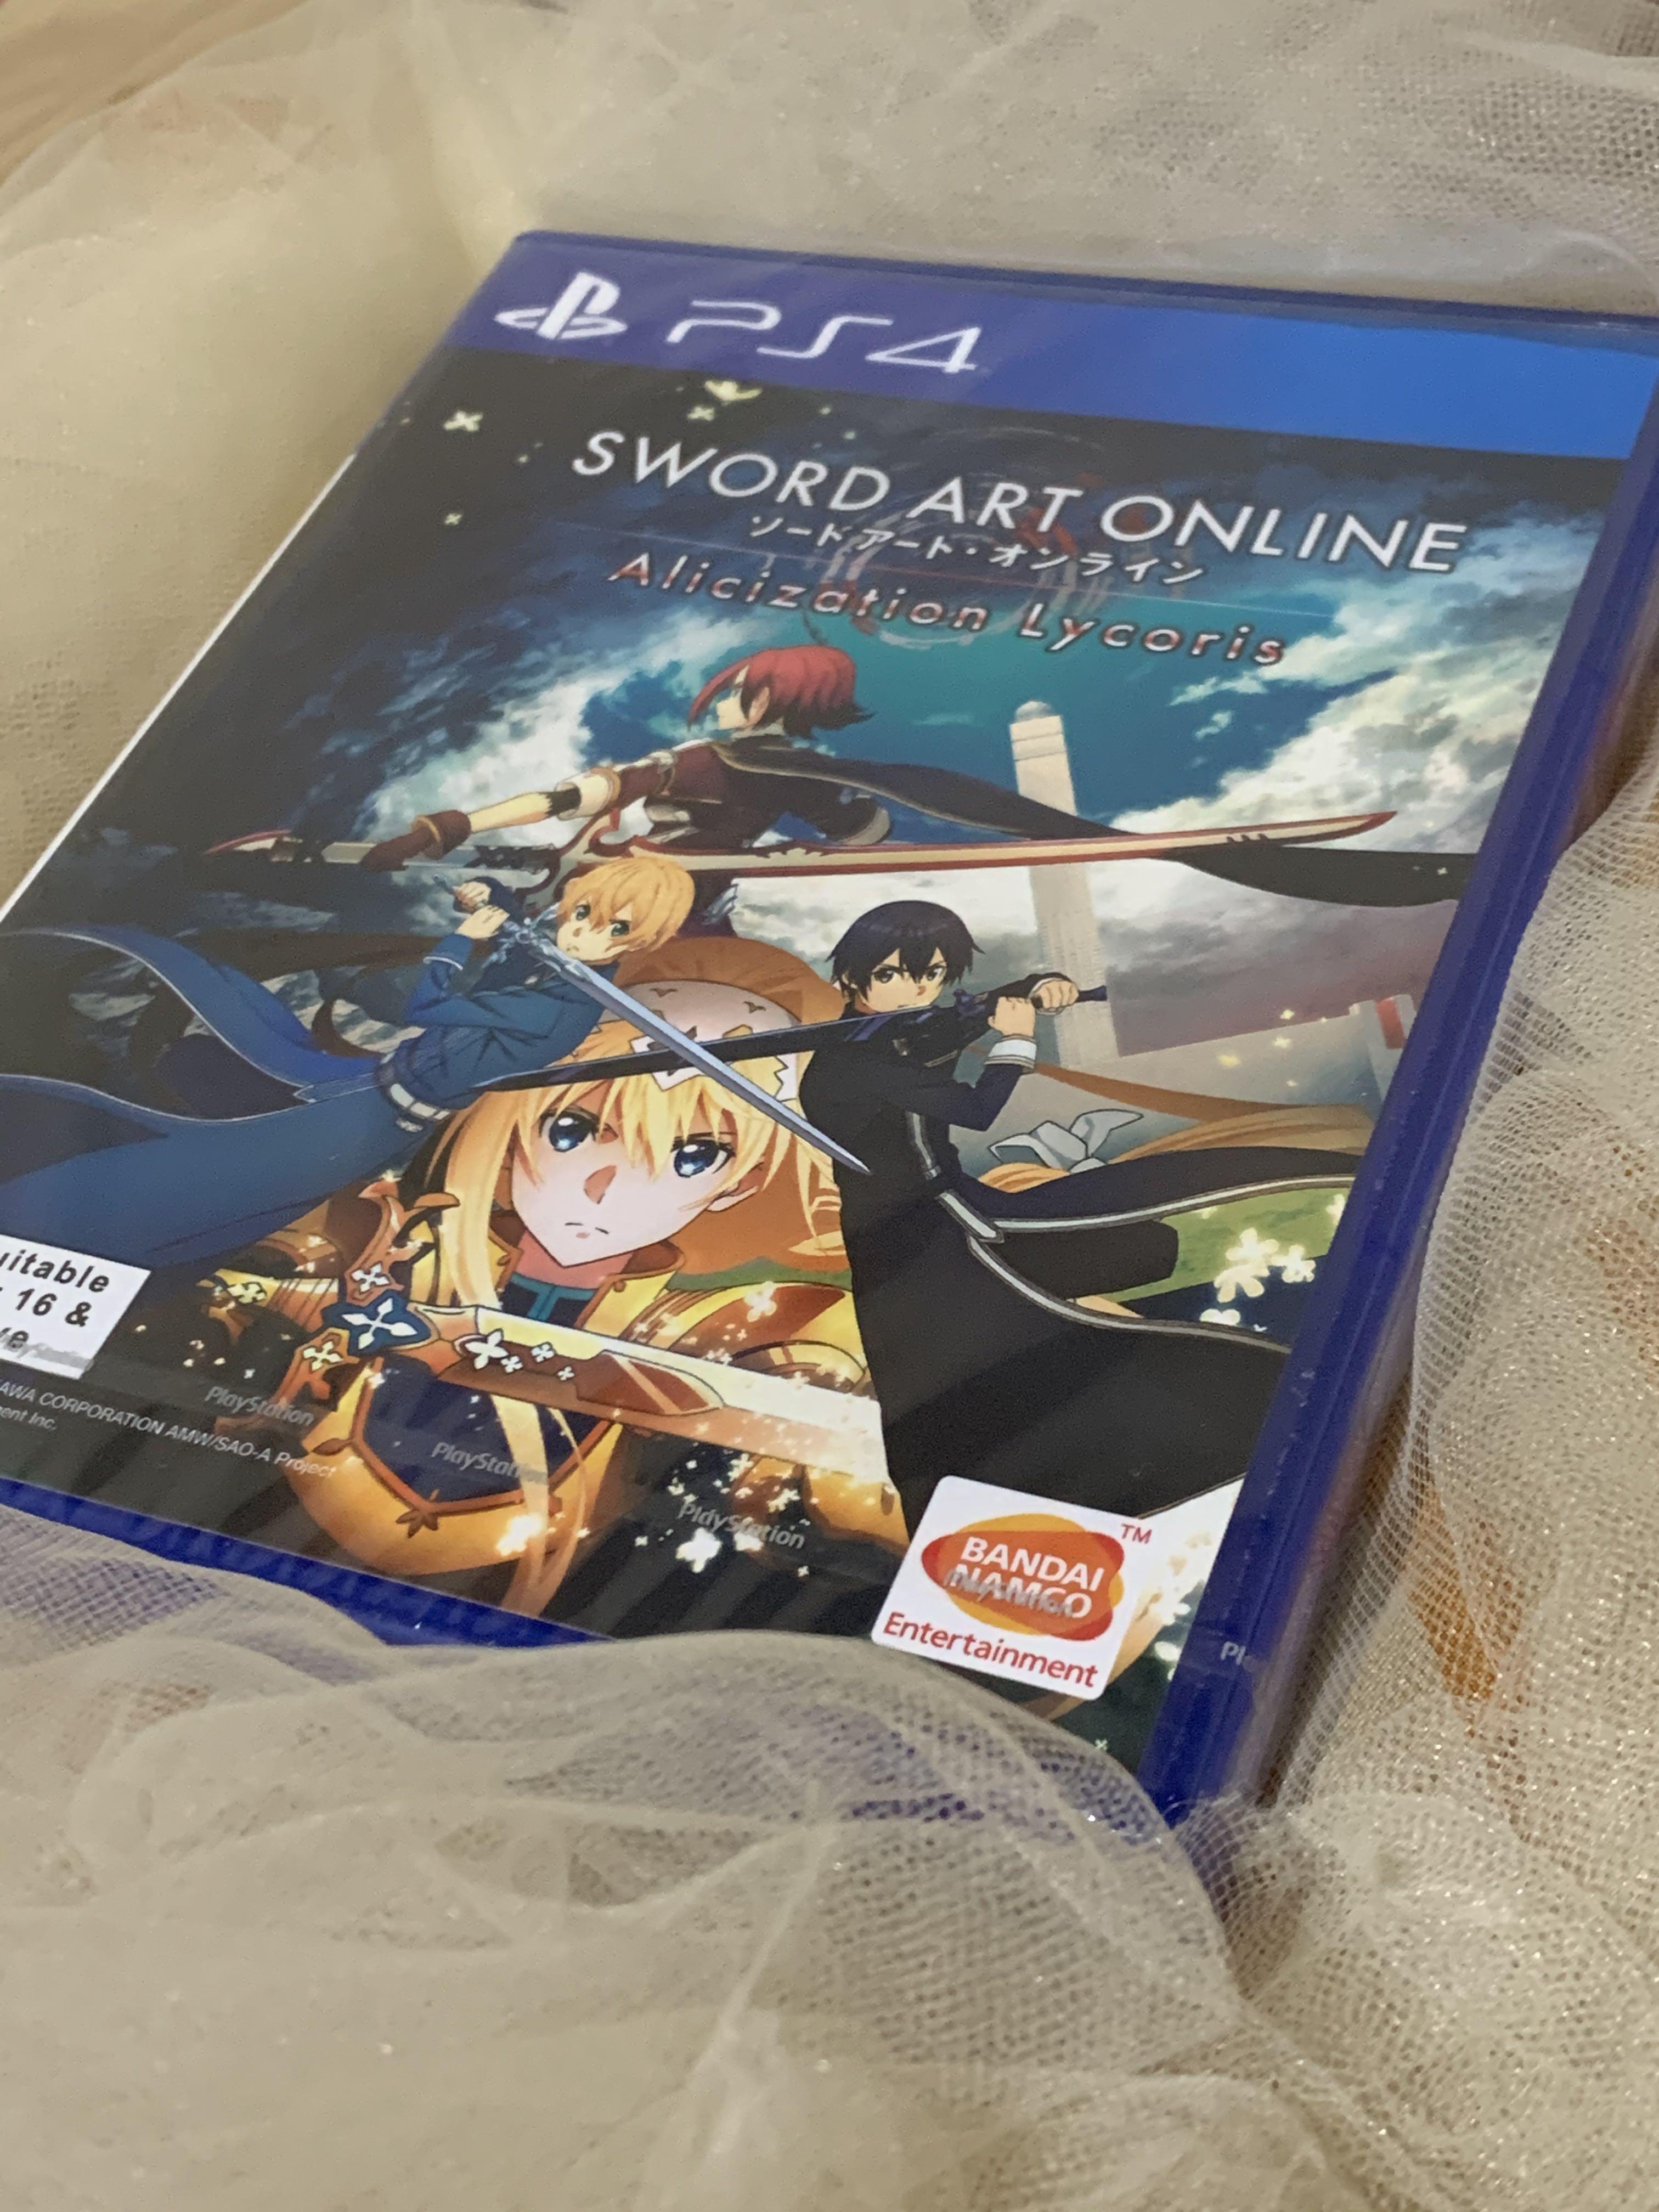 Kaset BD PS4 Sword Art Online (SAO) Alicization Lycoris